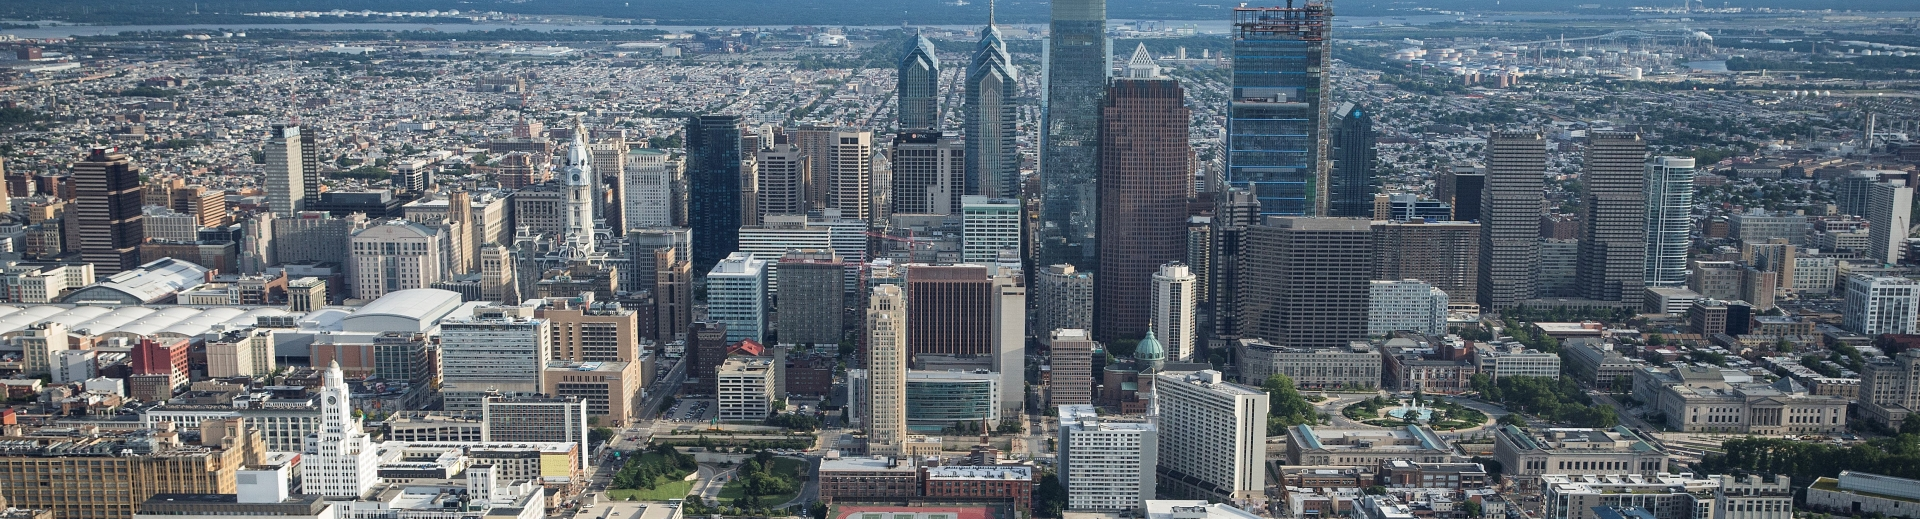 Philadelphia center city skyline aerial view.